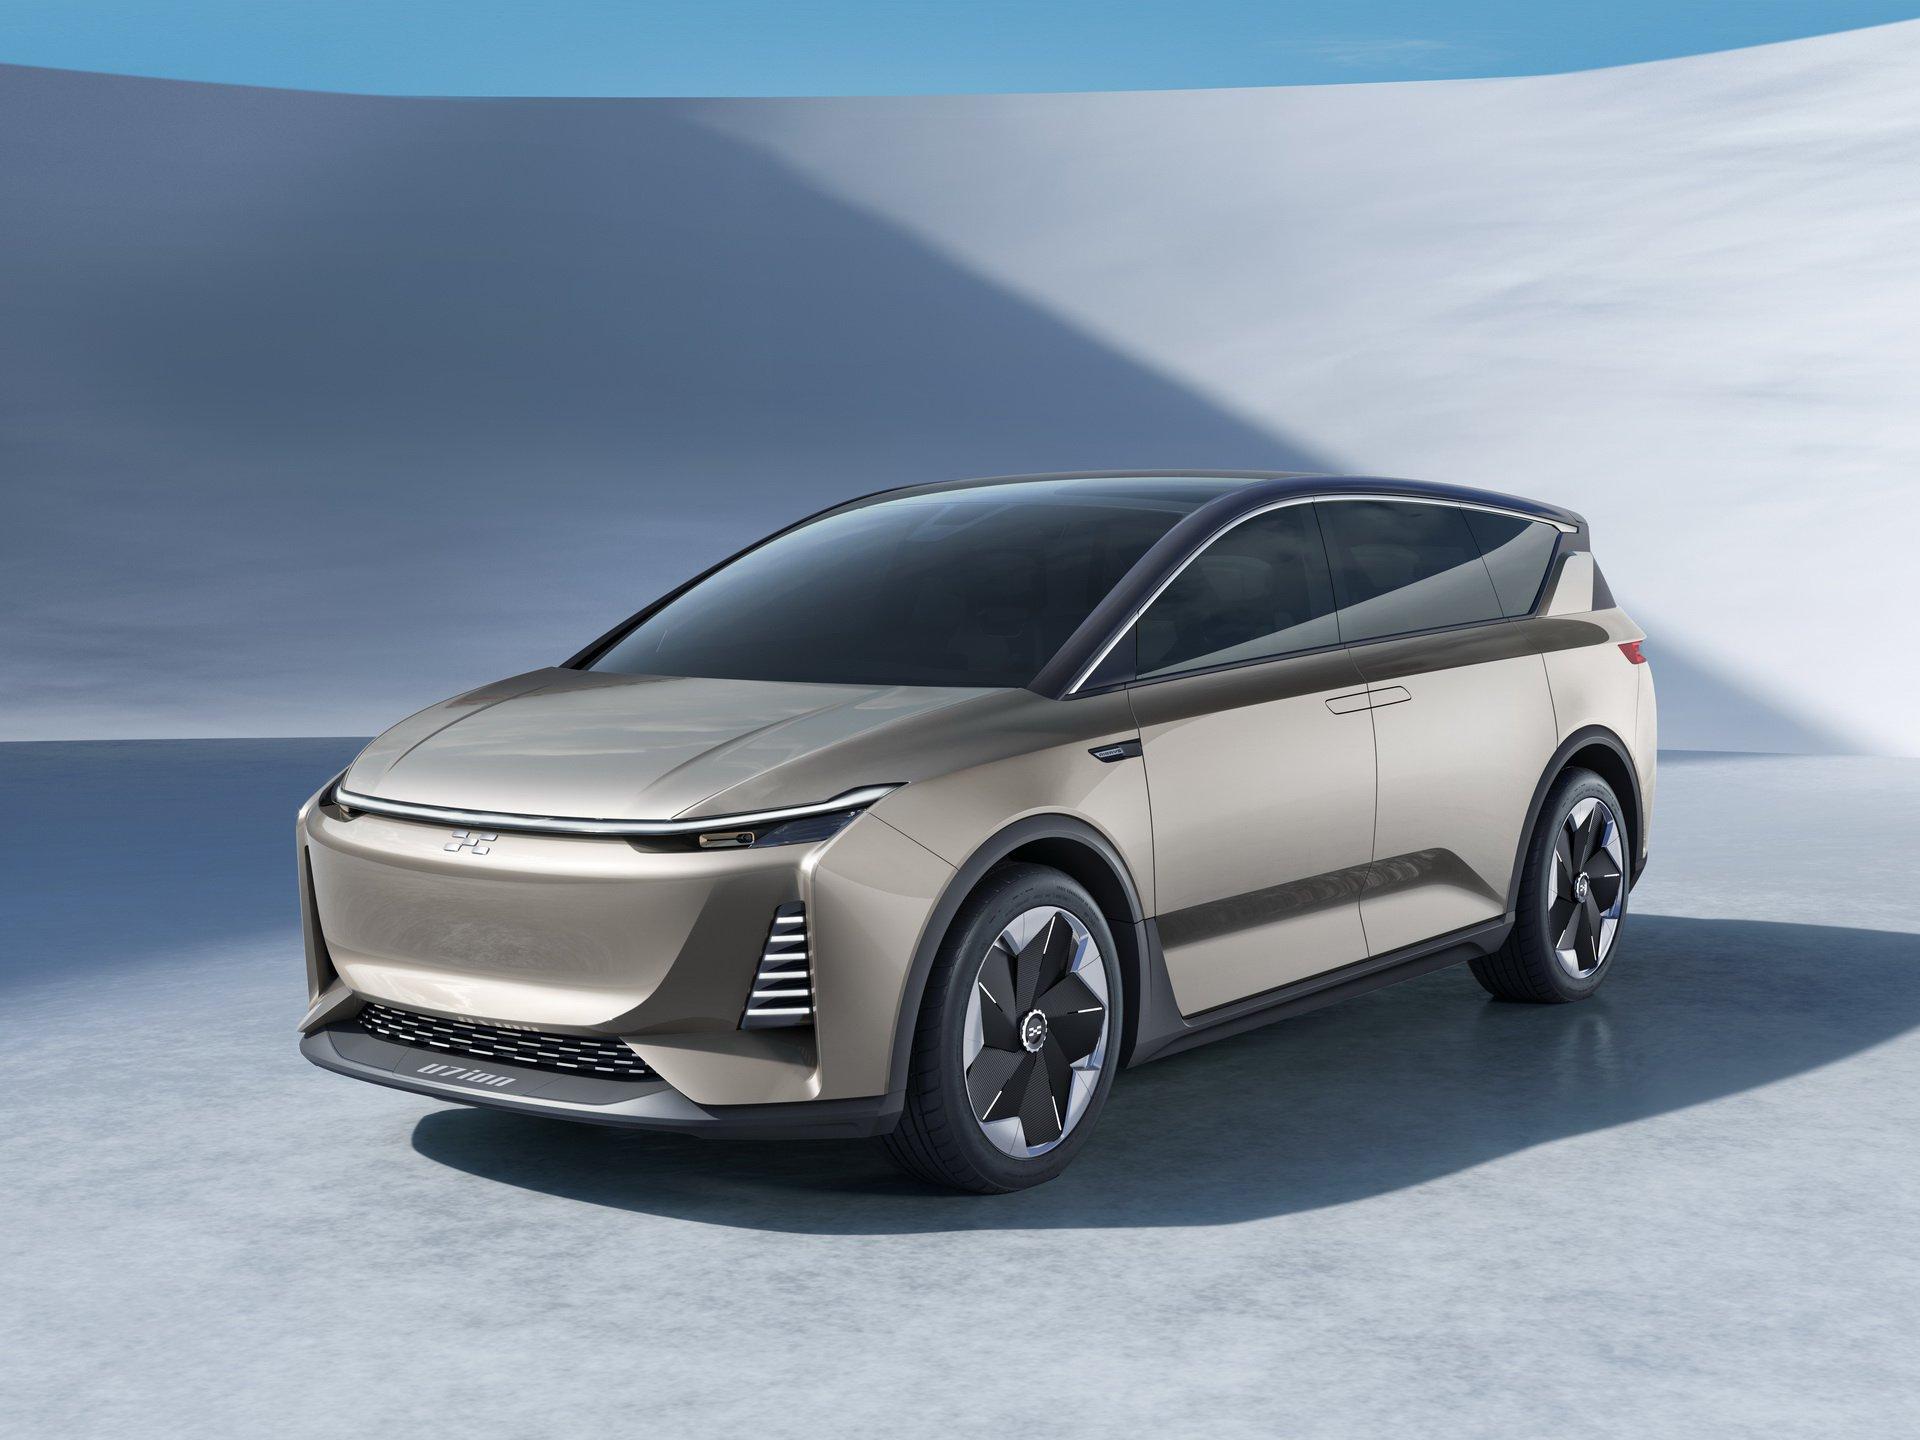 410e4ce3-aiways-u7-ion-concept-unveiled-shanghai-1